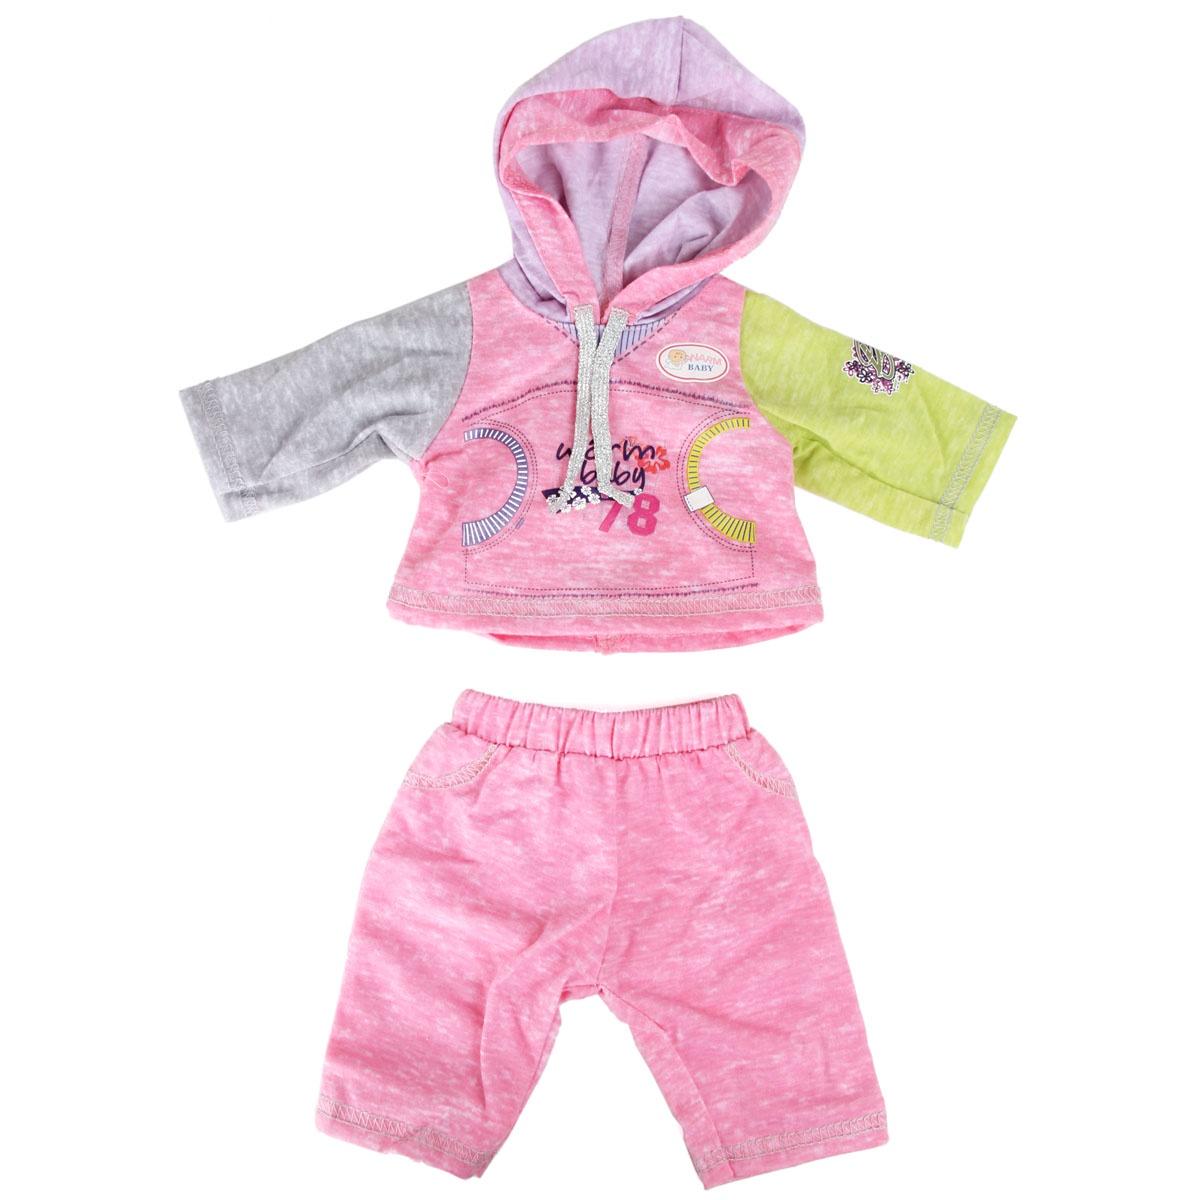 Одежда для кукол Veld Co 75907 куклы и одежда для кукол wei tai toys кукла с аксессуарами 35 см wtt6407